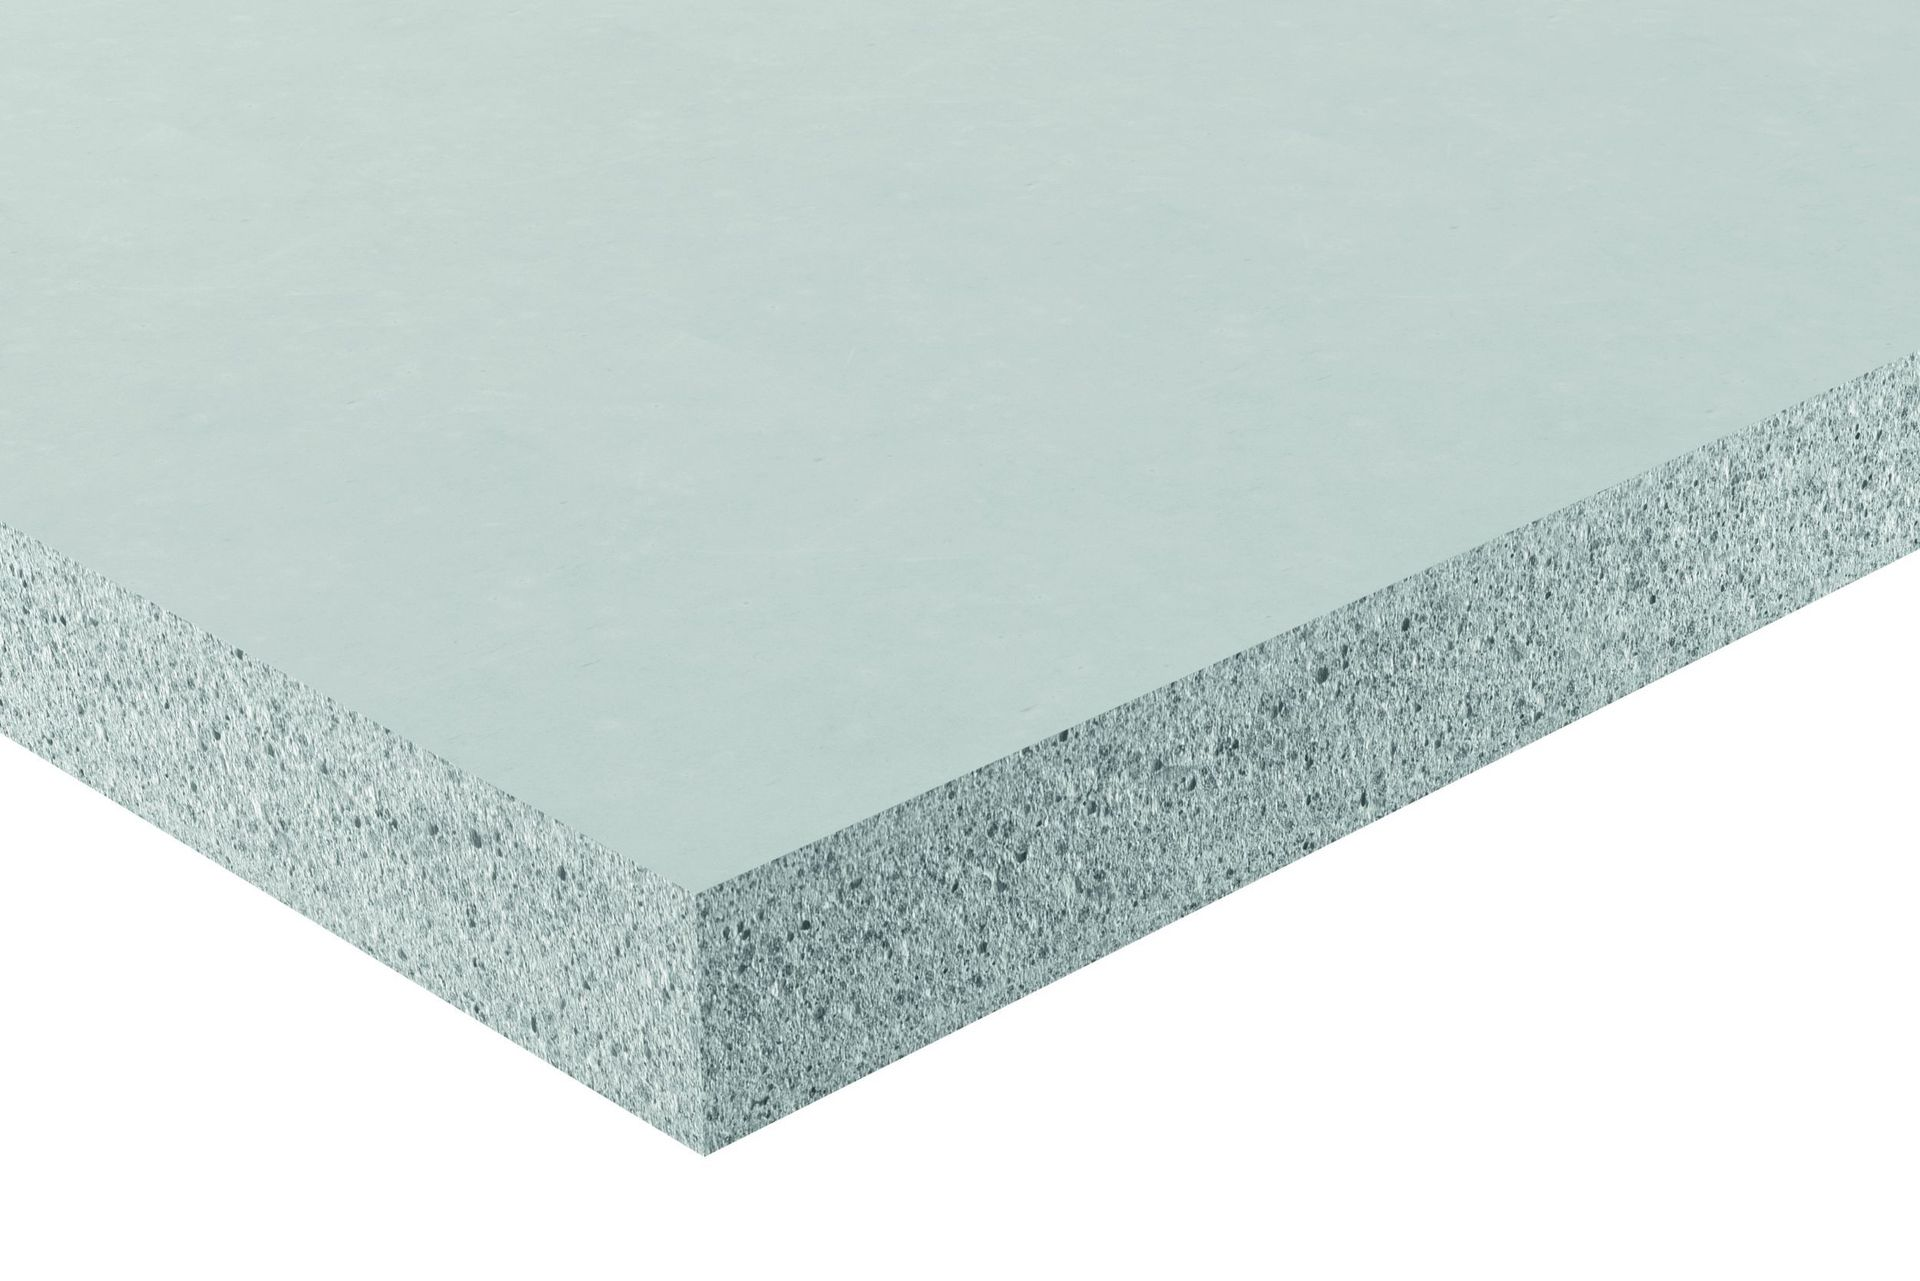 Knauf aquapanel cement board skylite mm baustoffklasse